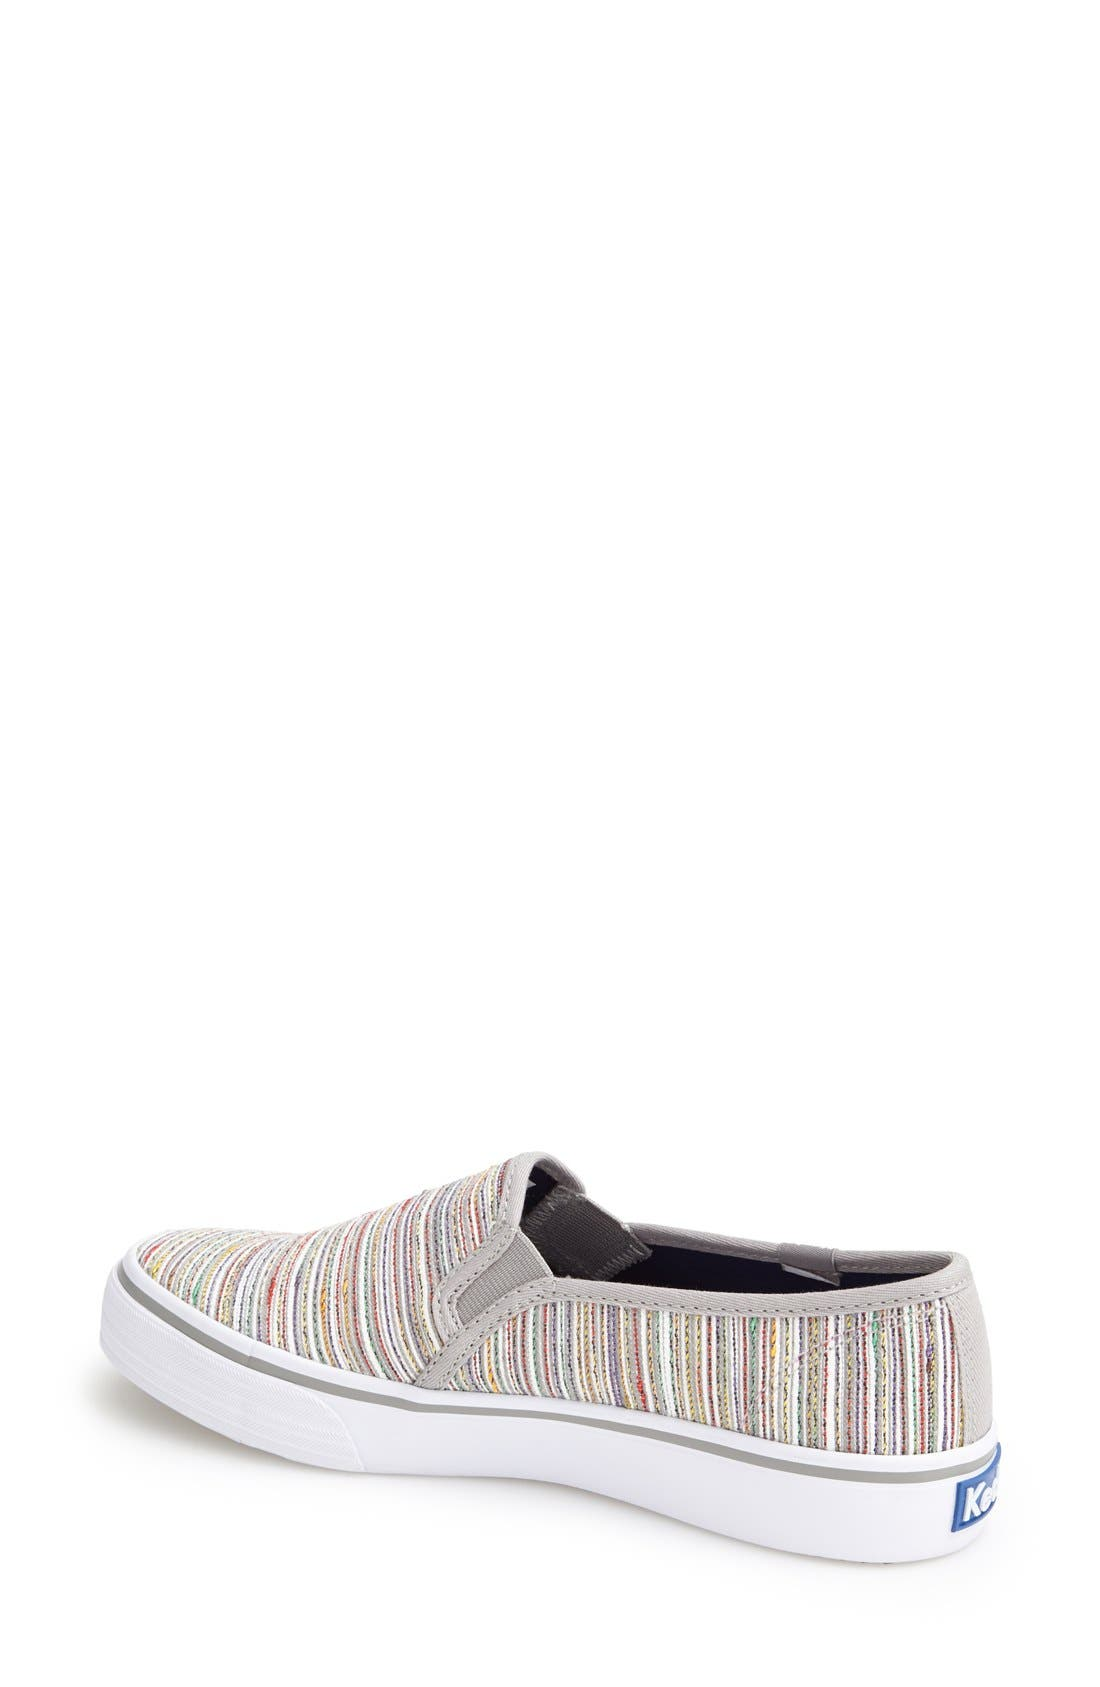 Alternate Image 2  - Keds® 'Double Decker - Woven Stripe' Slip-On Sneaker (Women)